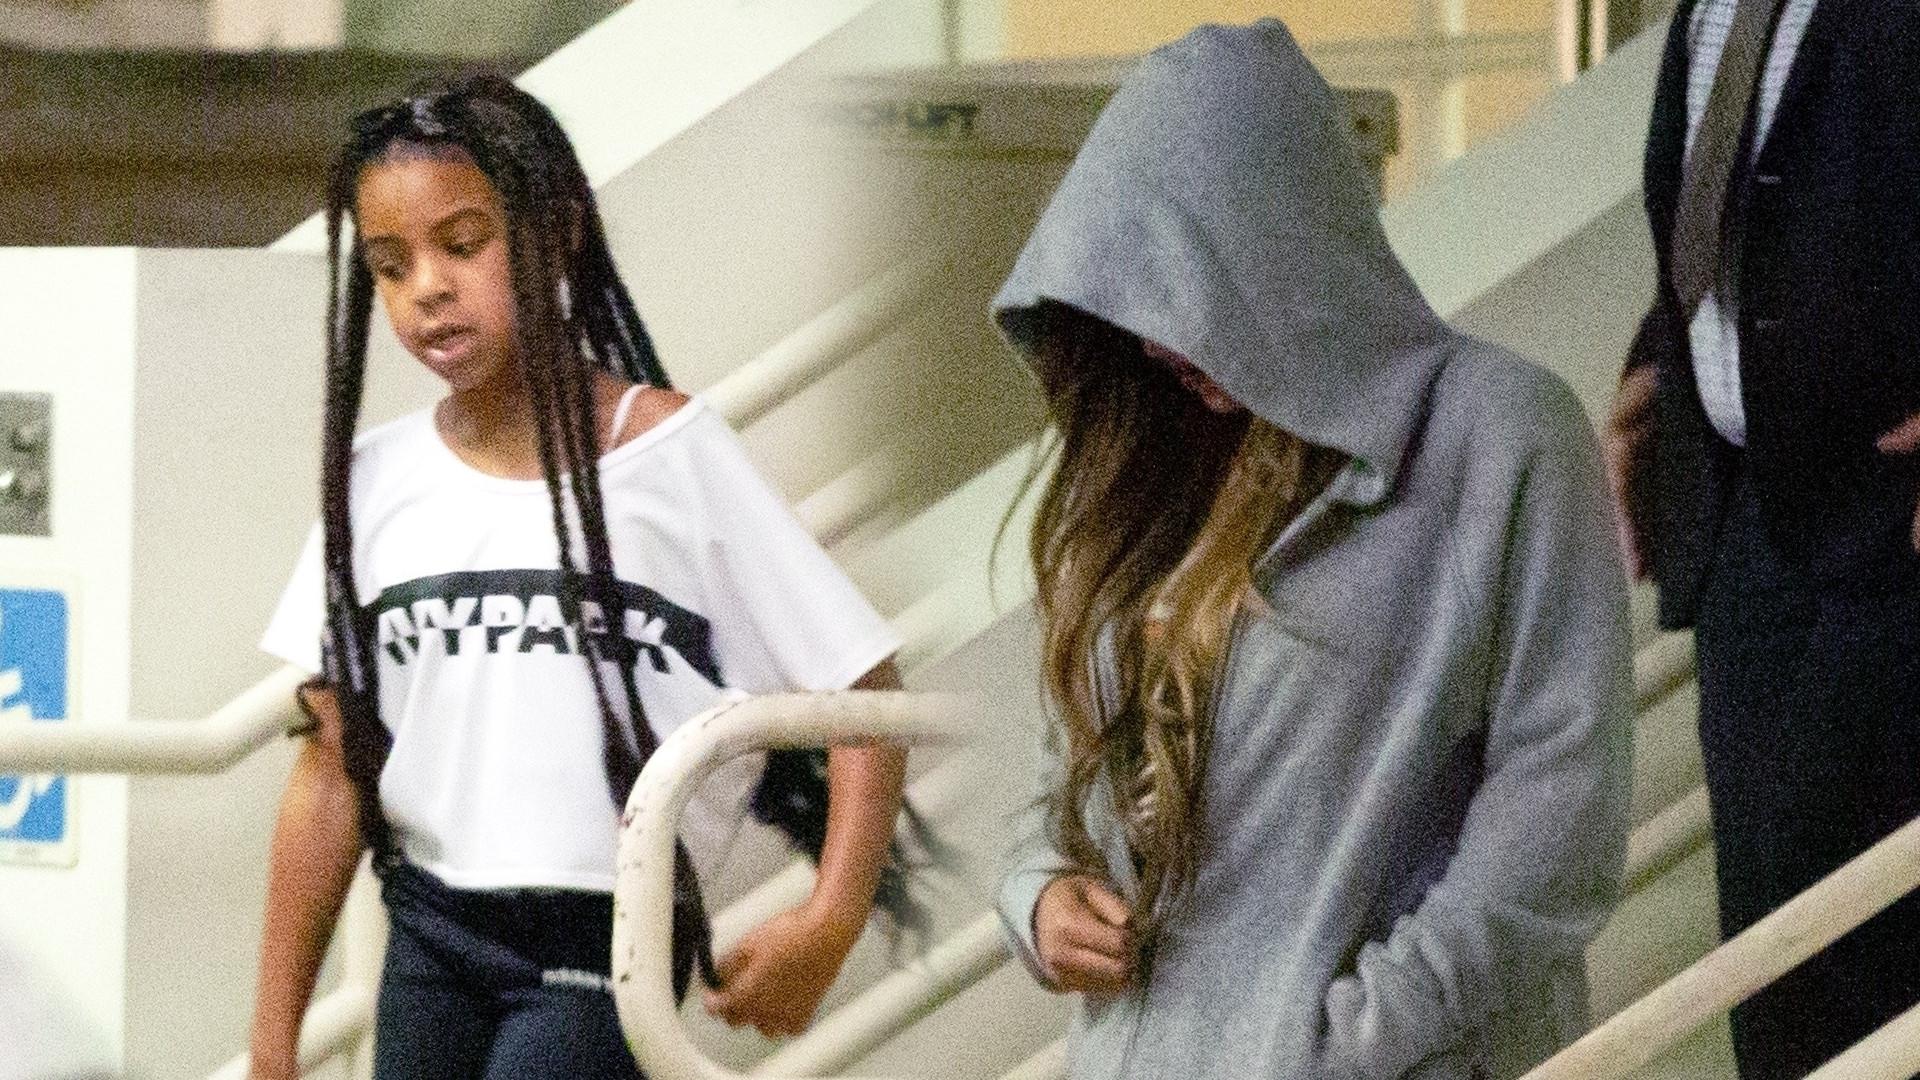 7-letnia córka Beyonce, Blue Ivy z mamą na zakupach (ZDJĘCIA)